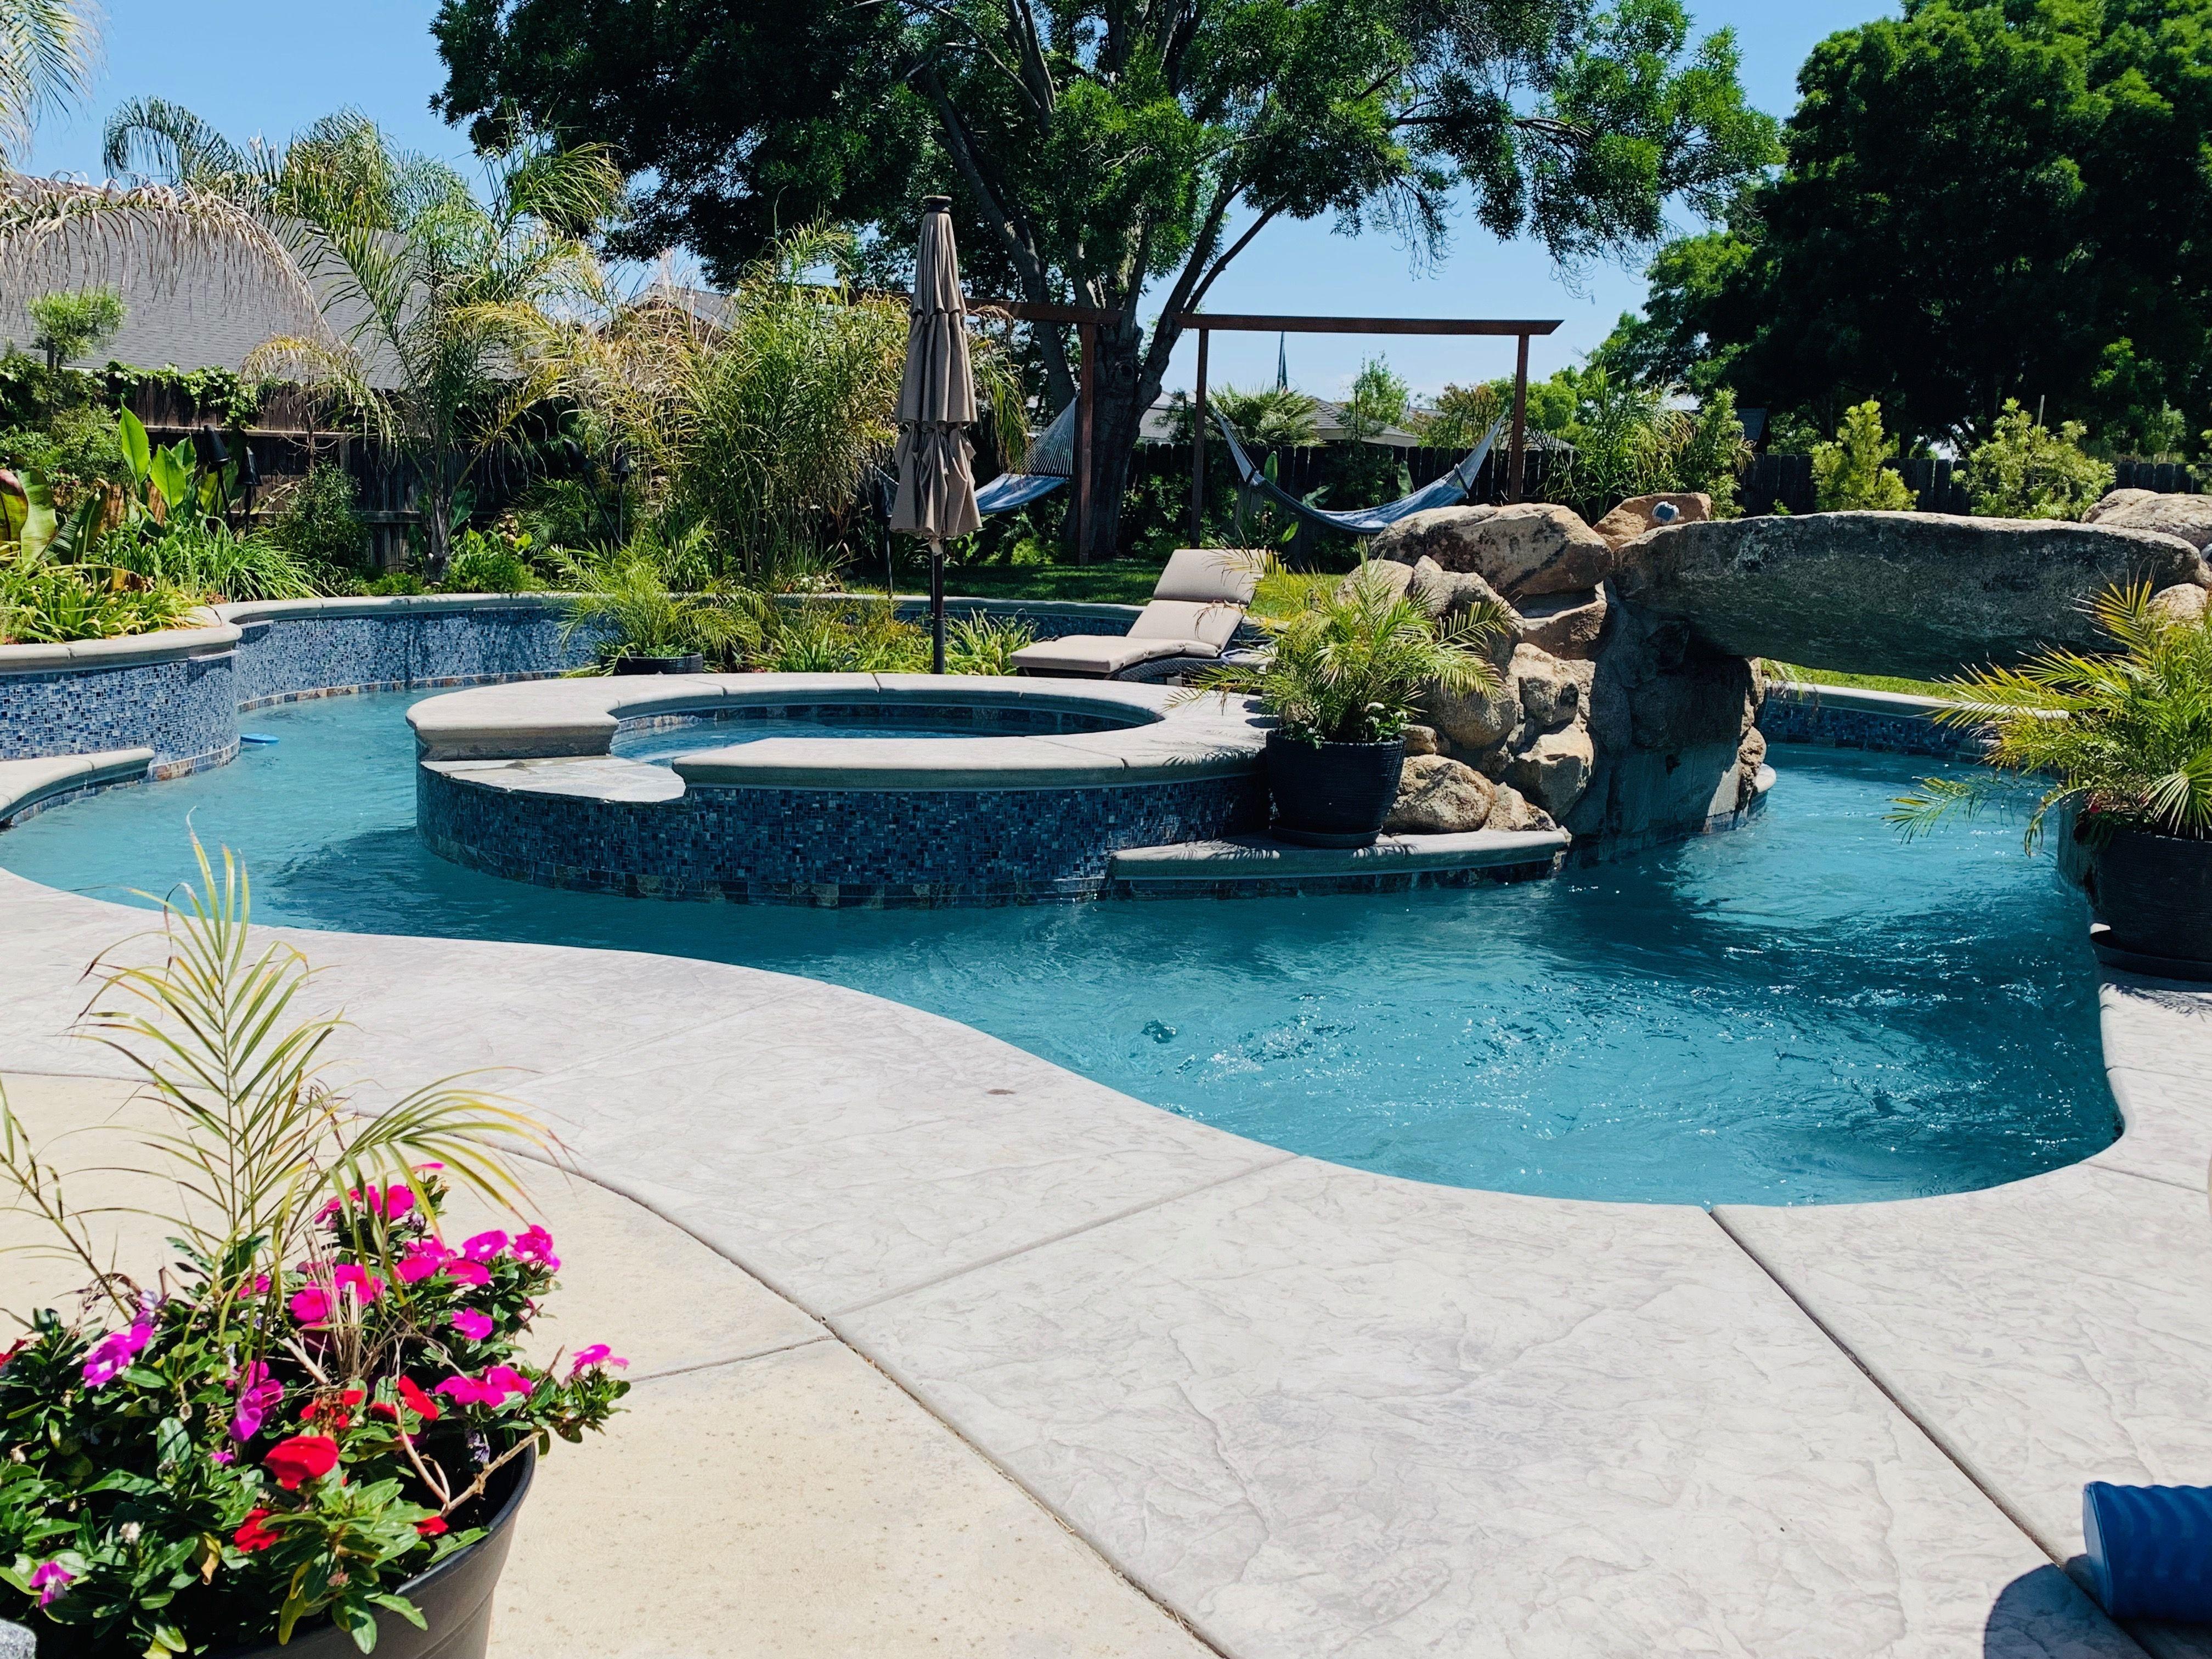 Hanford Lazy River Pool Spa Pcc2000 Cleaning Satin Matrix Pebble